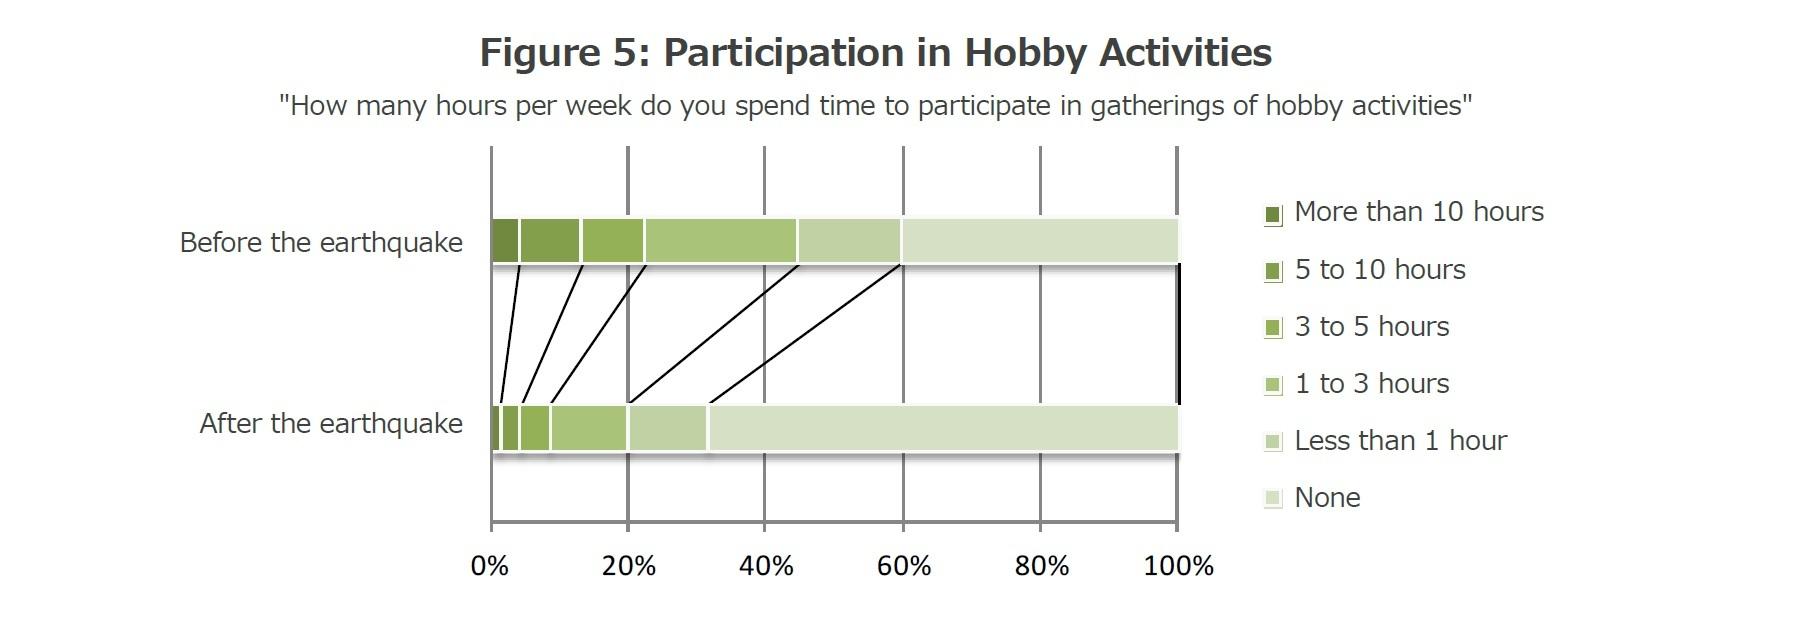 Figure 5: Participation in Hobby Activities